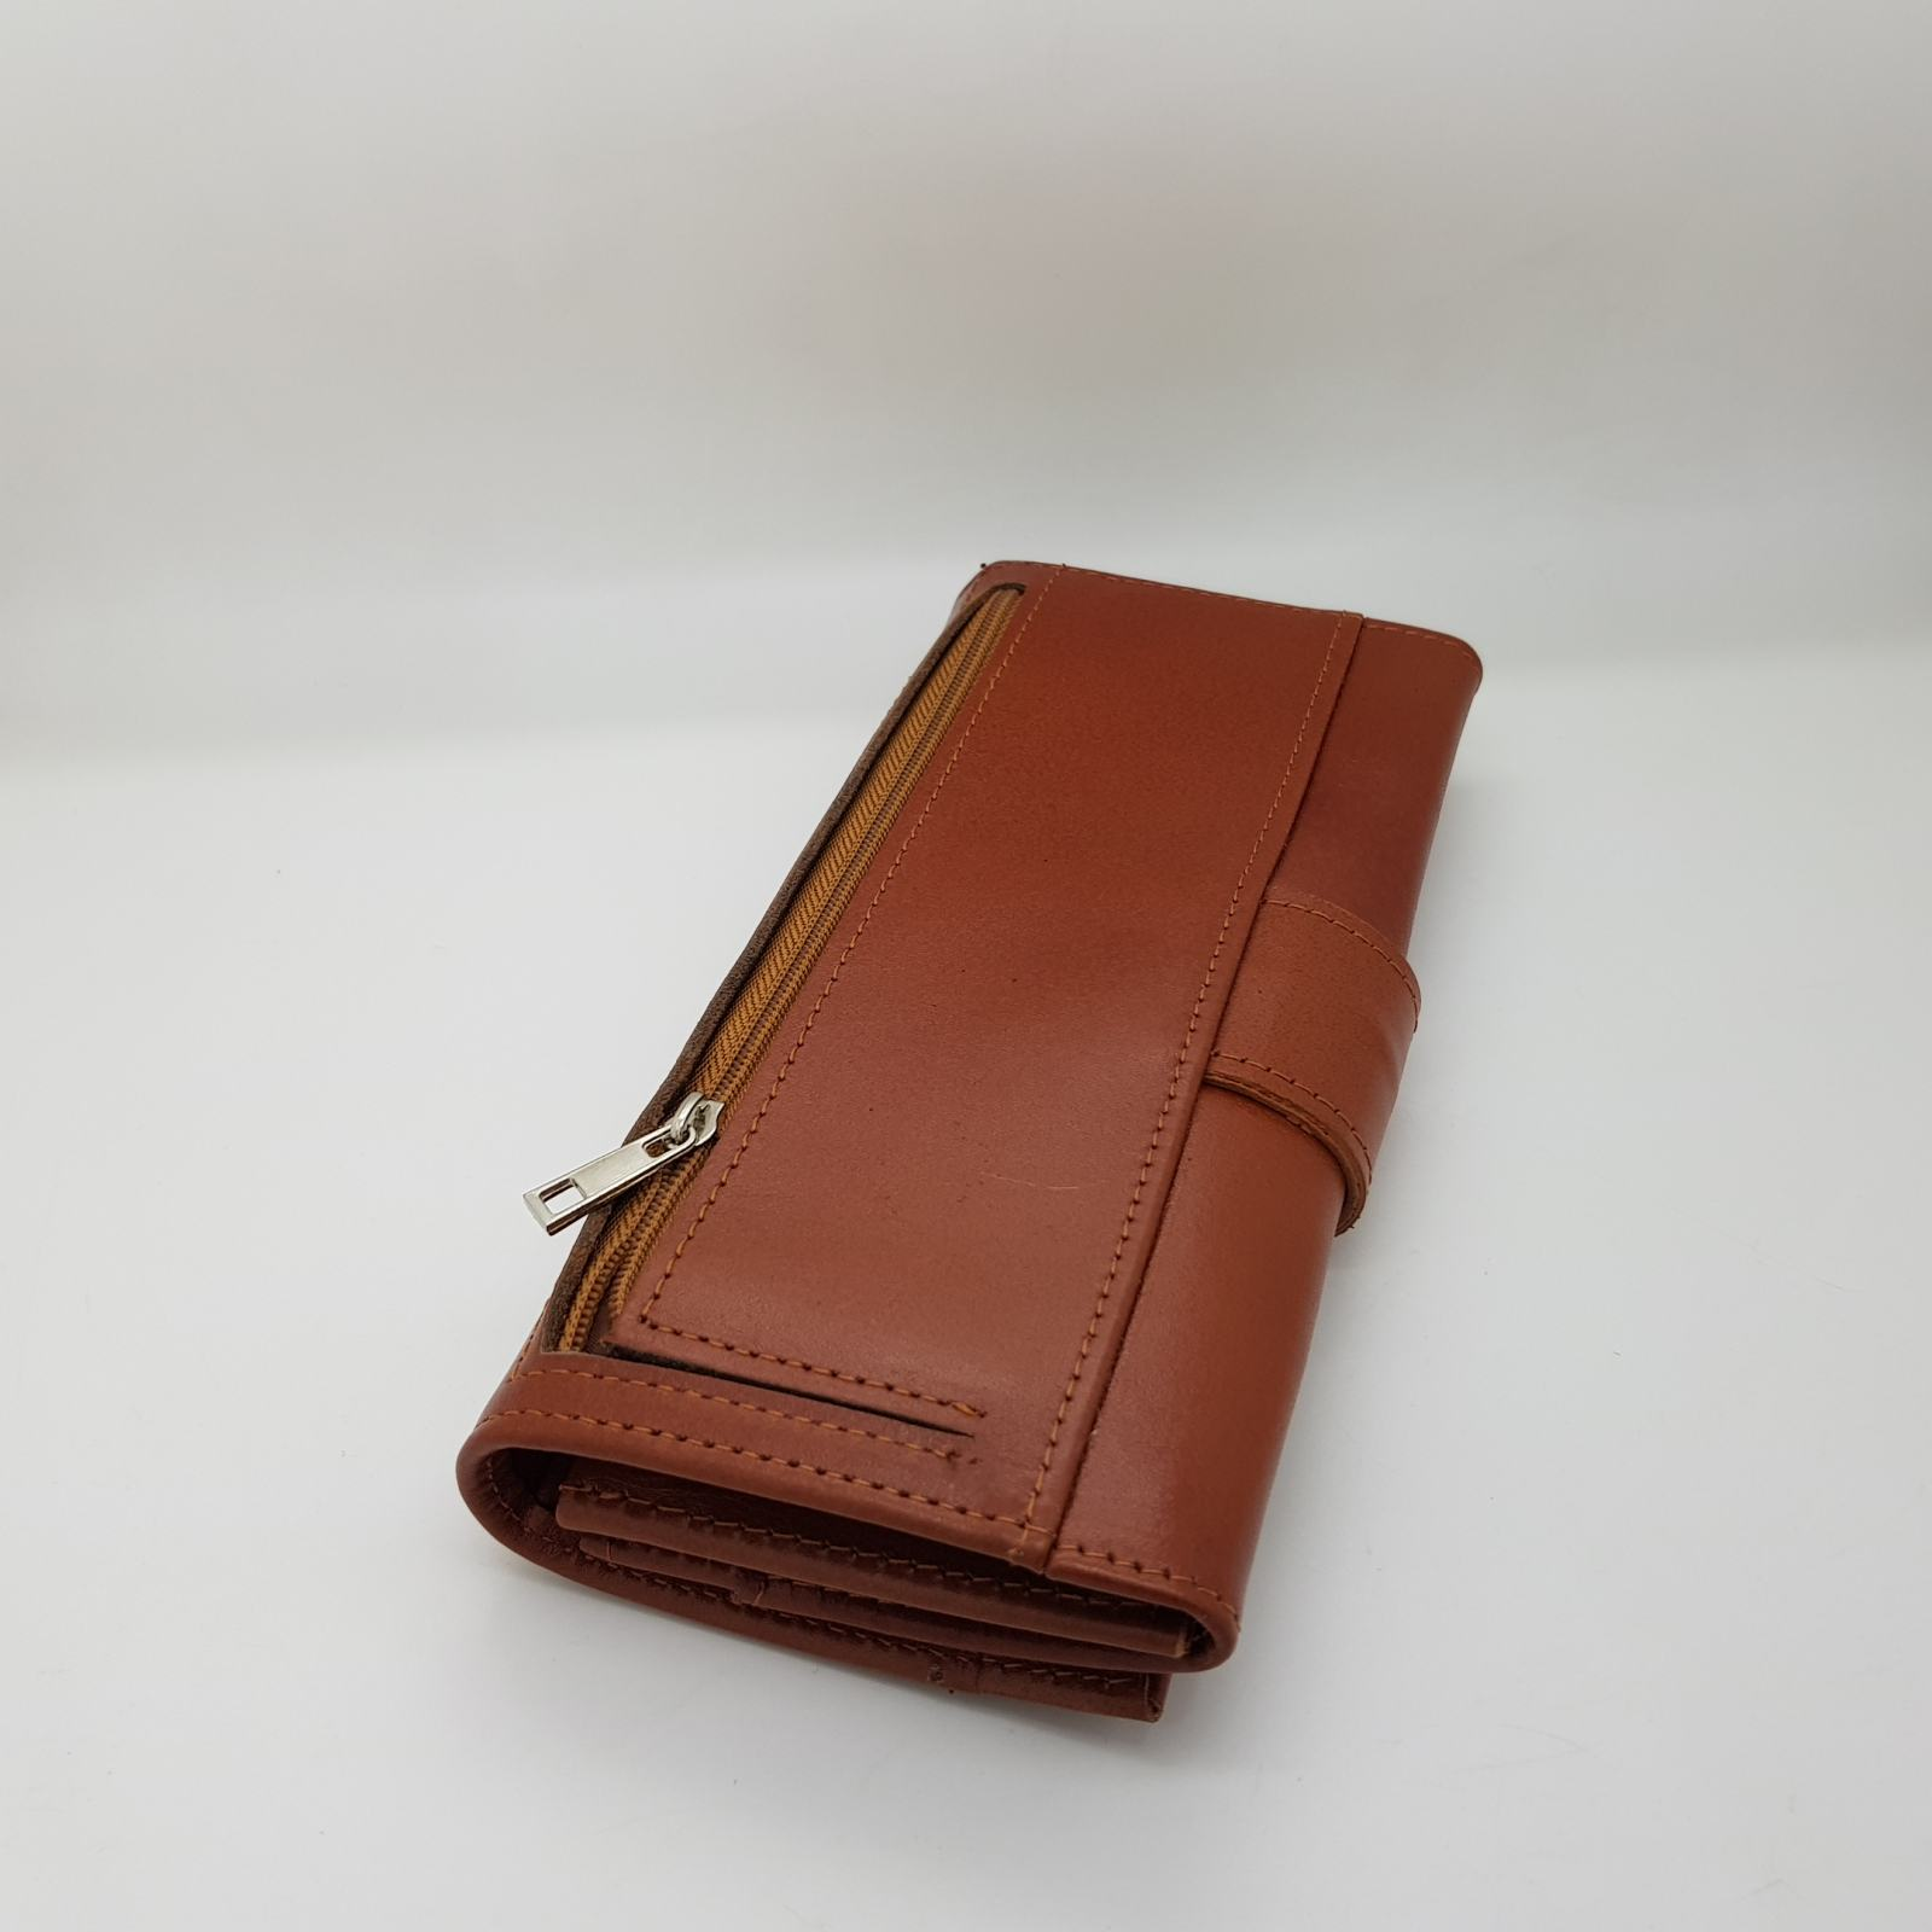 کیف پول زنانه چرم دیاکو مدل 315 -  - 9